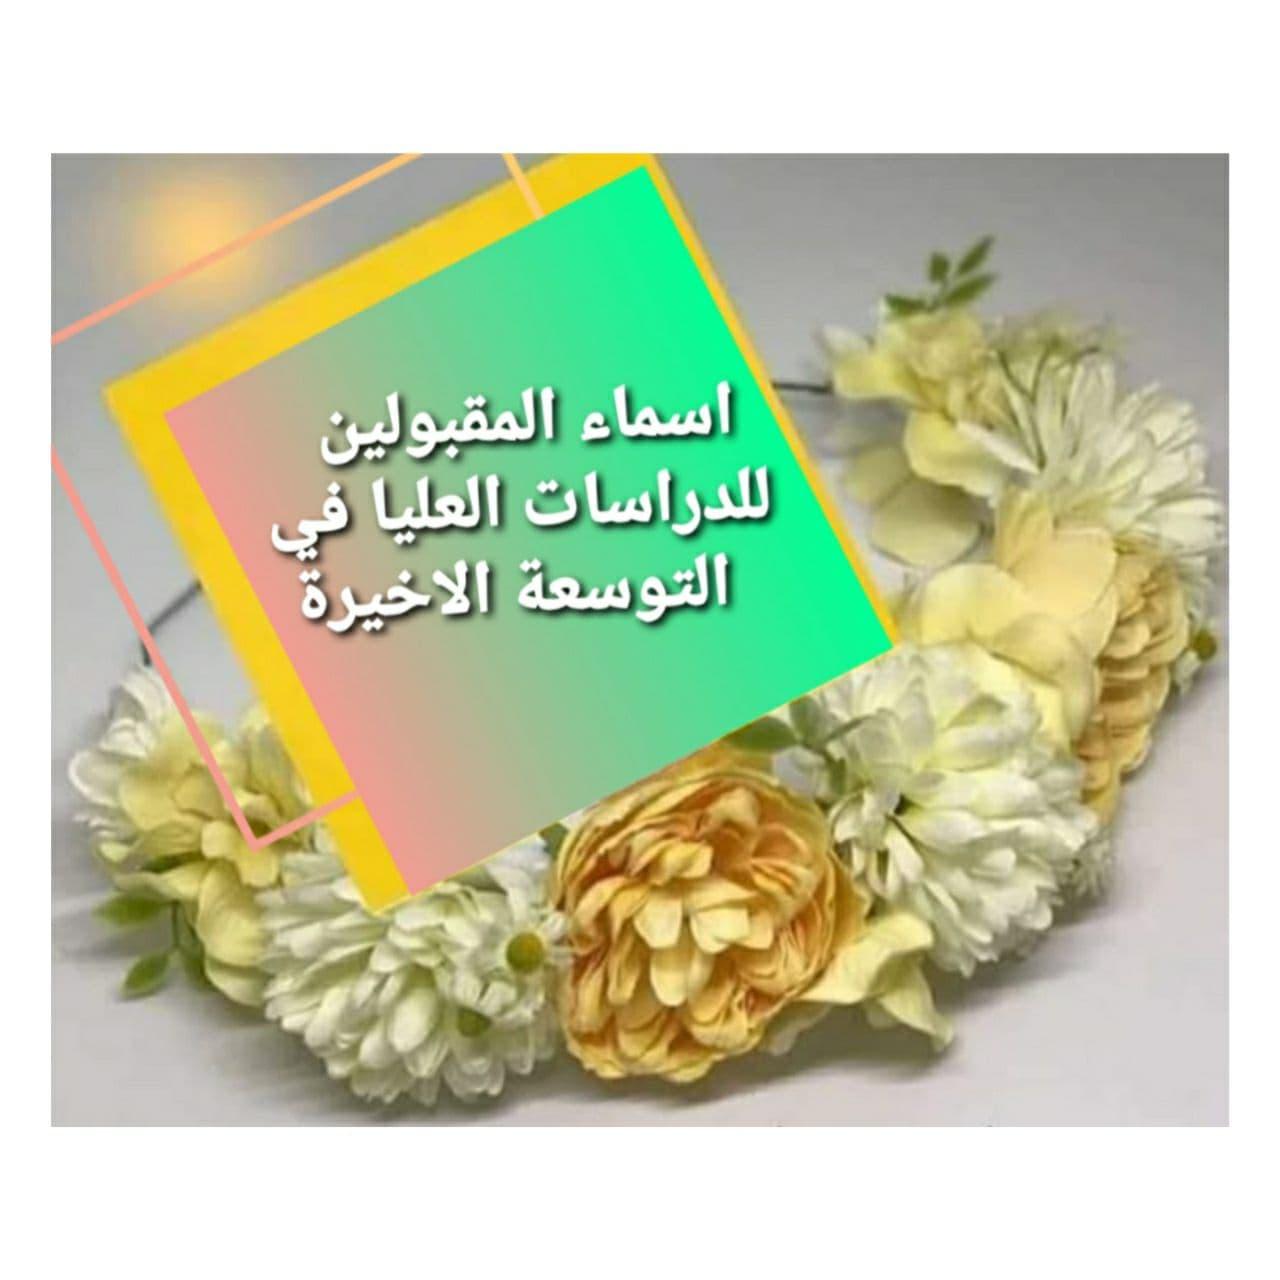 Read more about the article اسماء الطلبة المقبولين للدراسات العليا في كلية الادارة والاقتصاد في التوسعه الاخيره